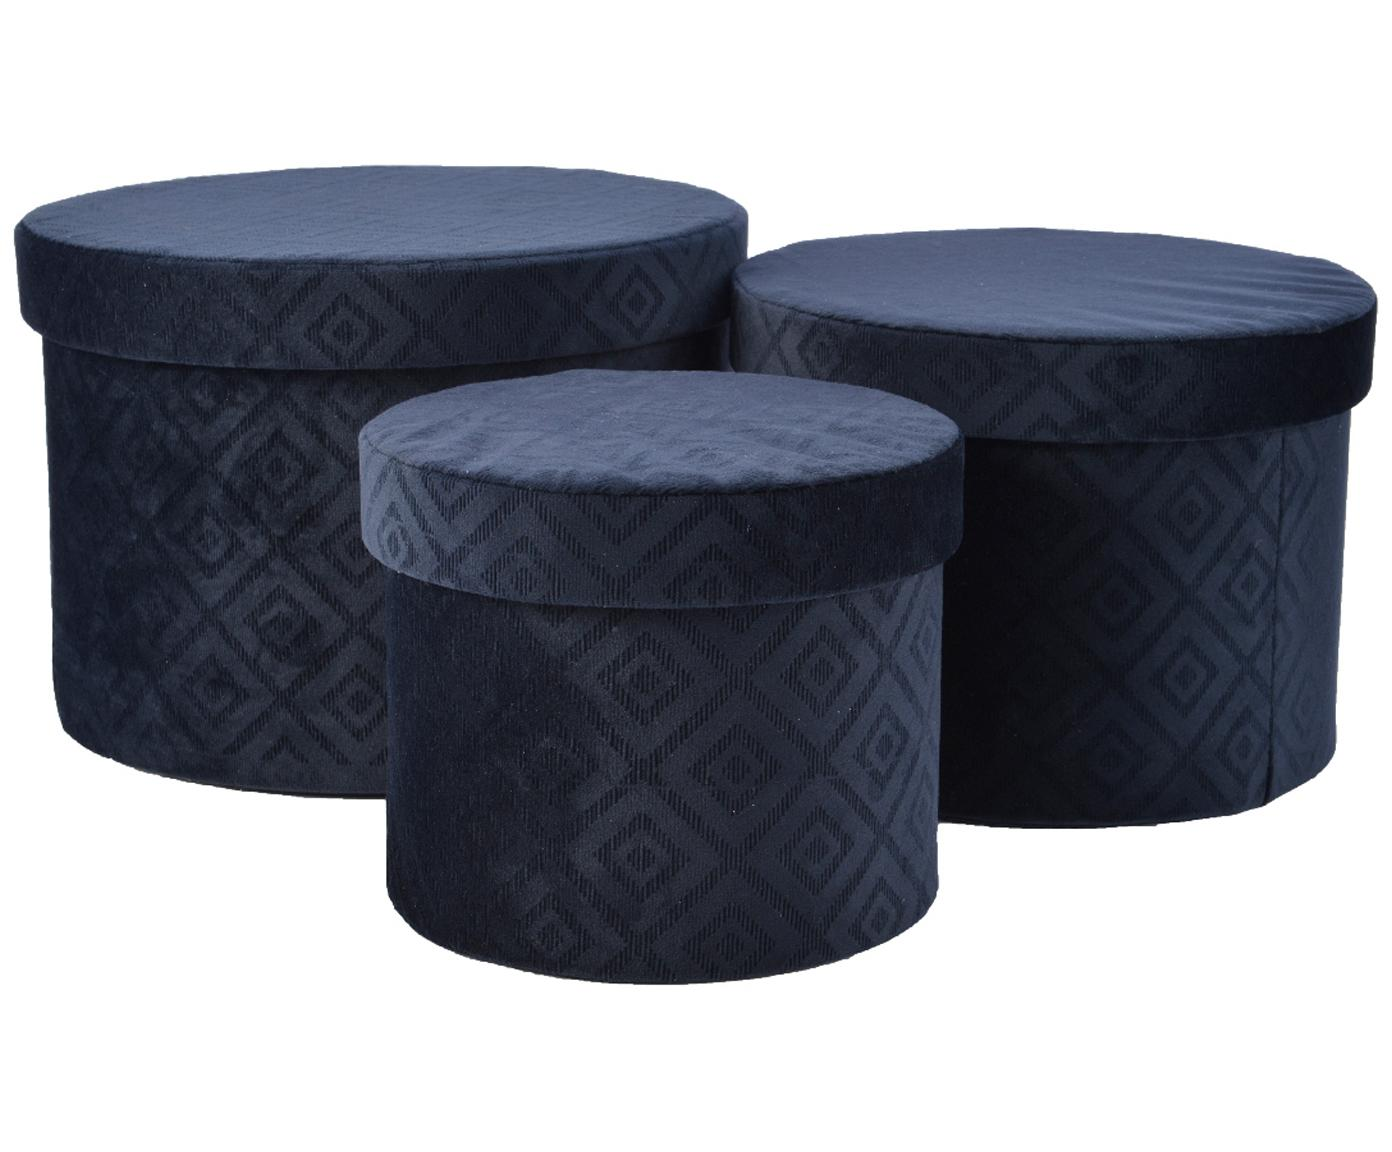 Fluwelen geschenkdozenset Trinity Caro, 3-delig, Polyesterfluweel, Donkerblauw, Verschillende formaten